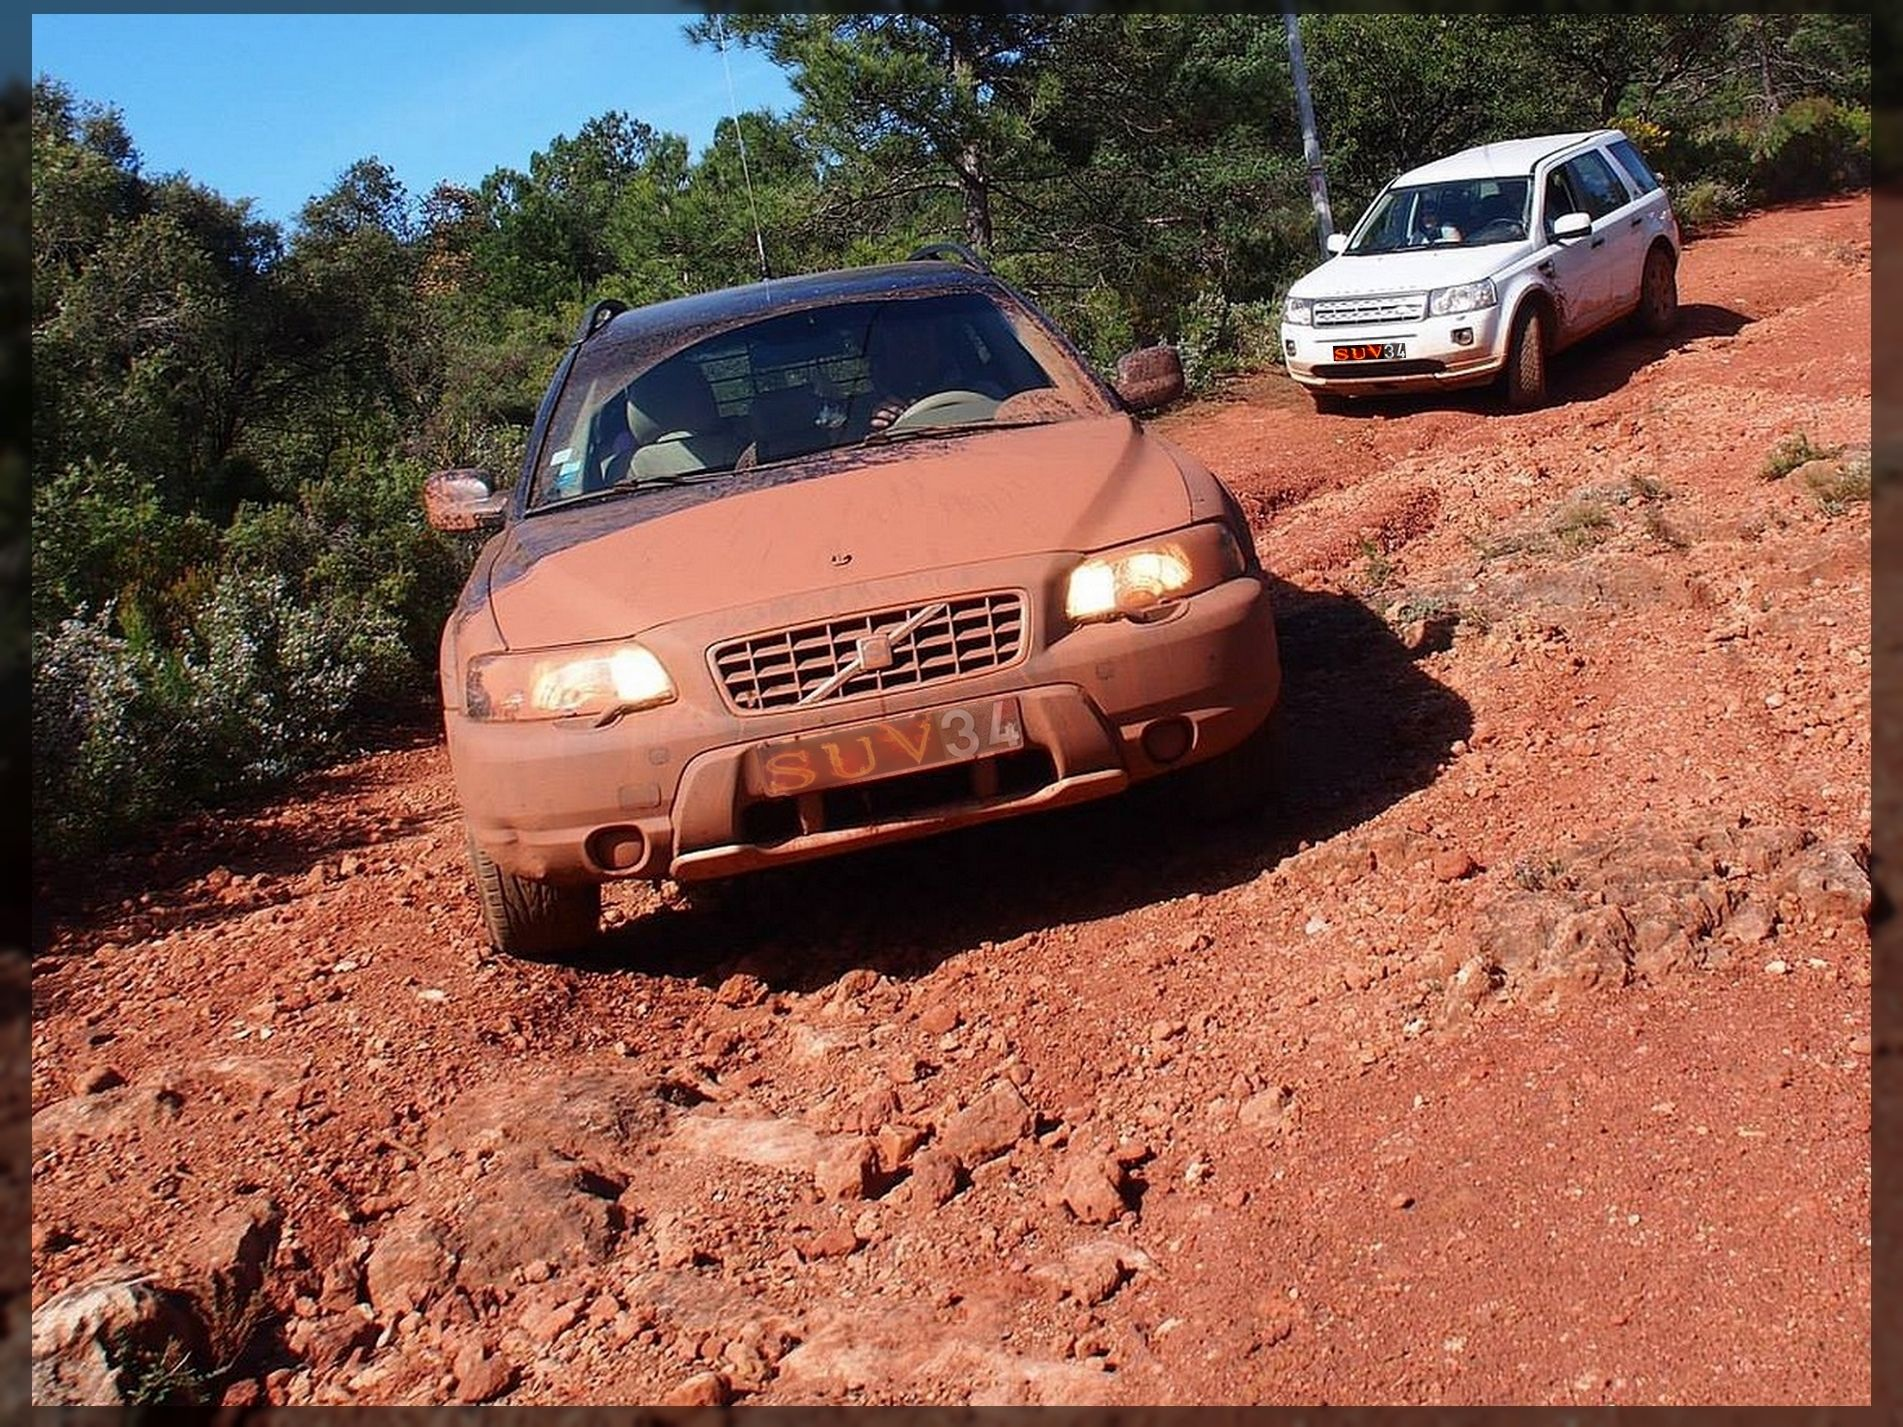 Volvo Xc70 D5 Offroad Mud Suv 34